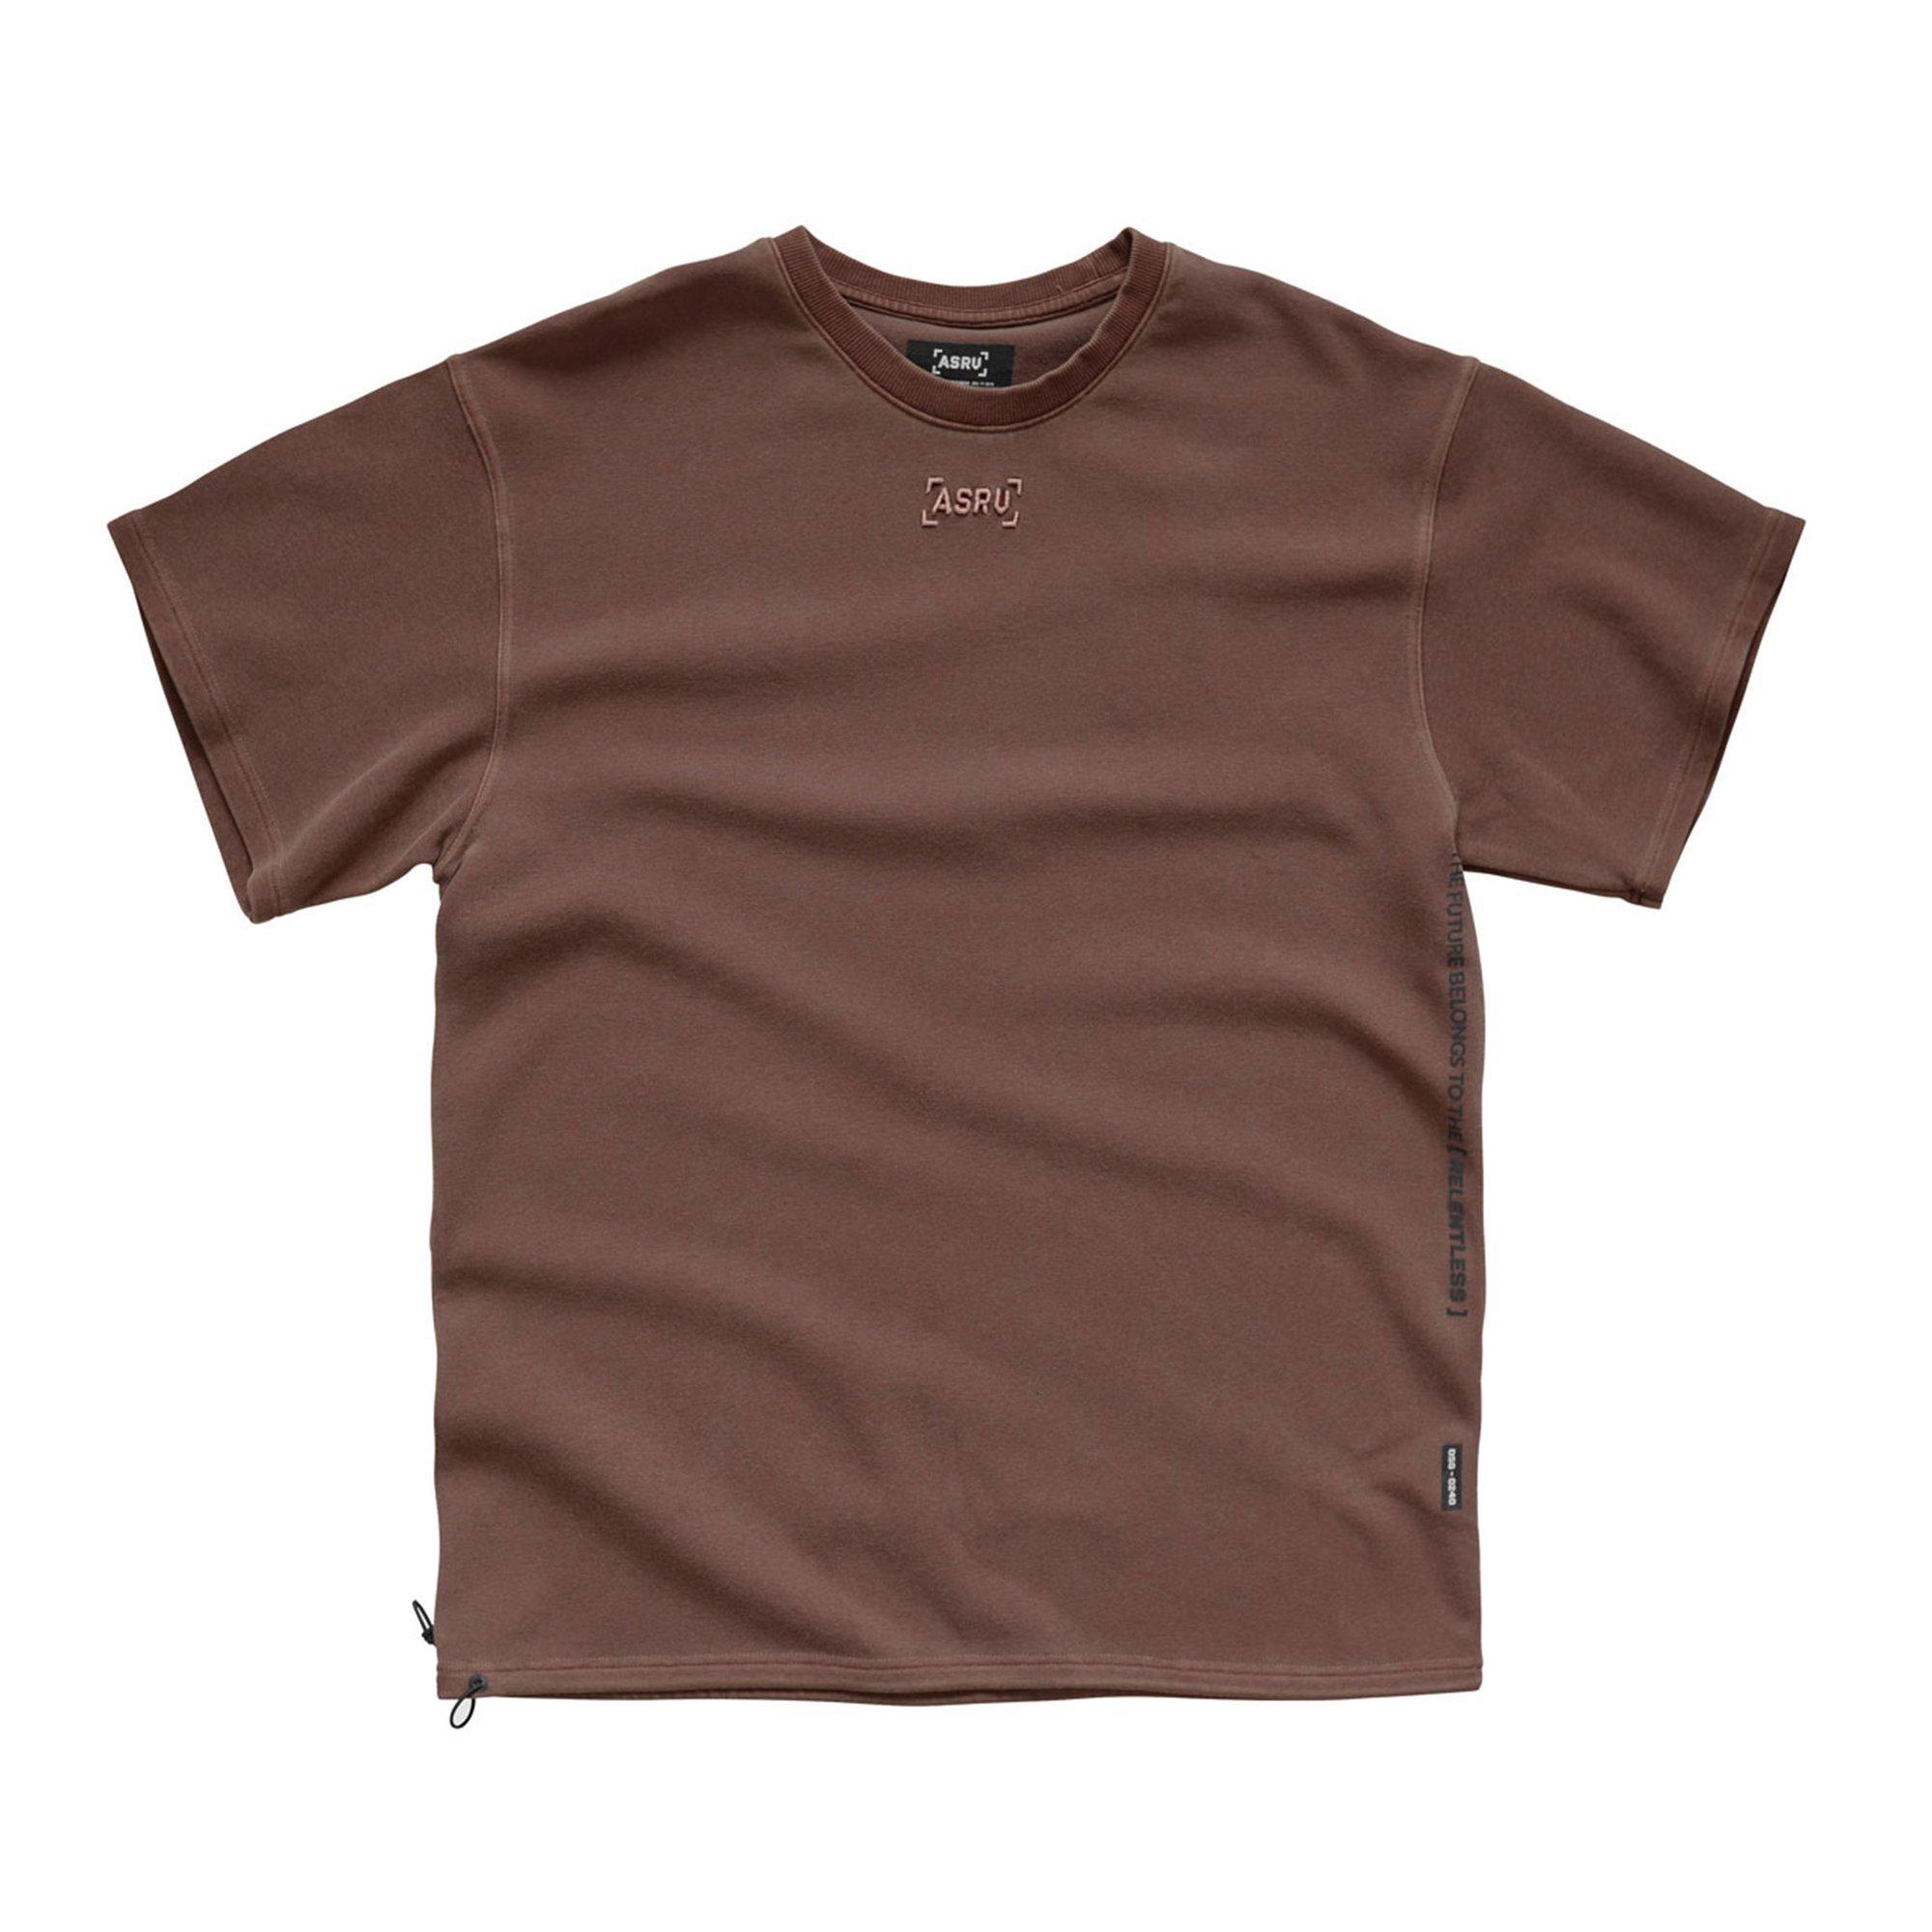 【ASRV】SilverPlus® テクニカルTシャツ - Washed Merlot